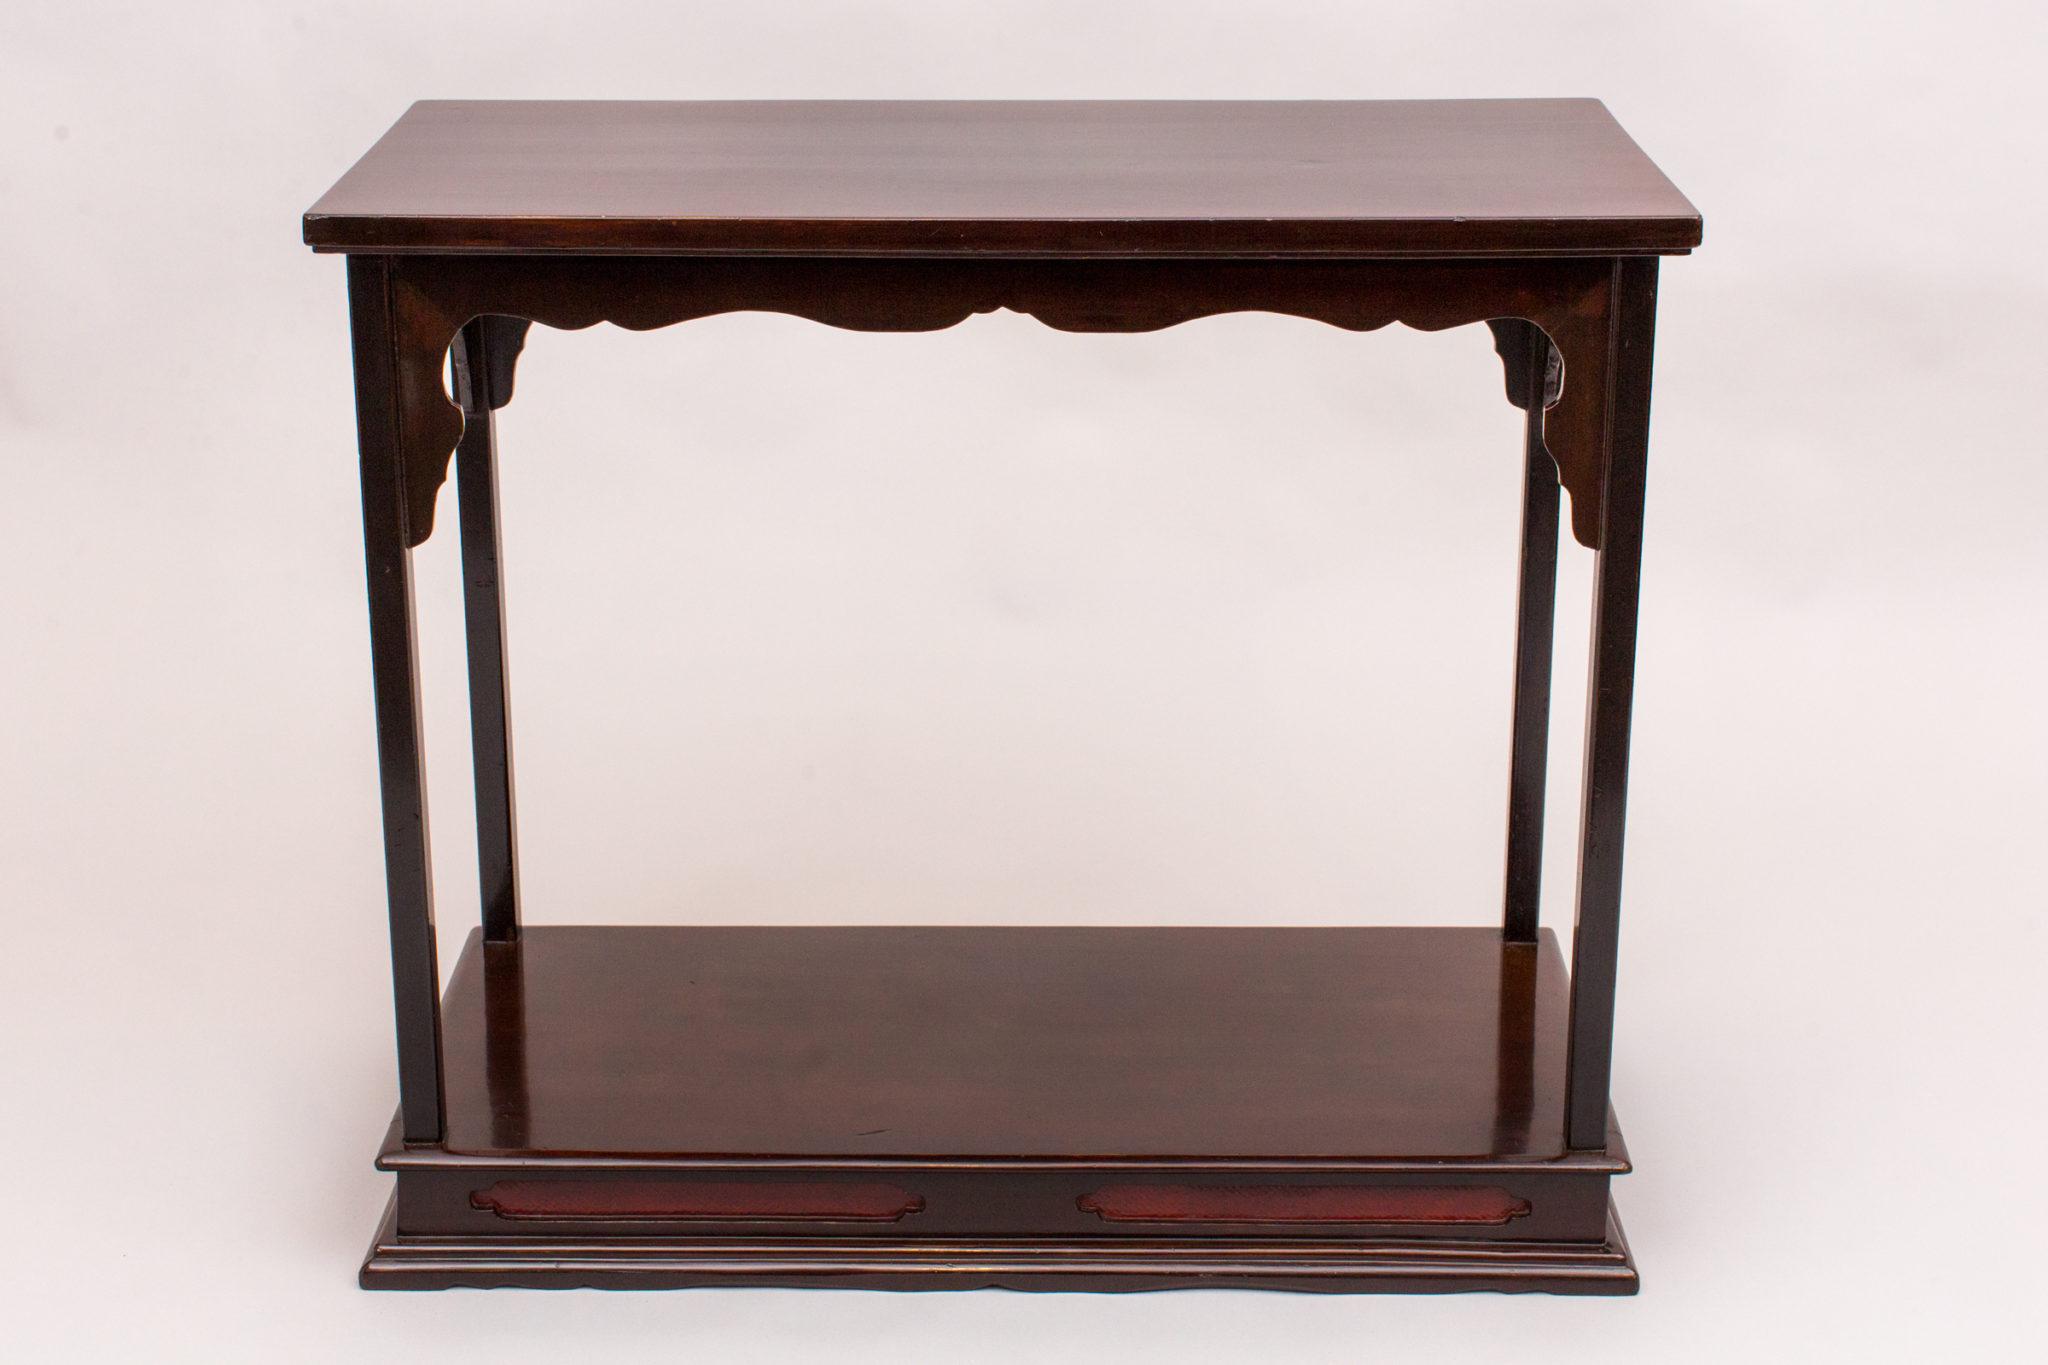 Antique Japanese Lacquer Presentation Table